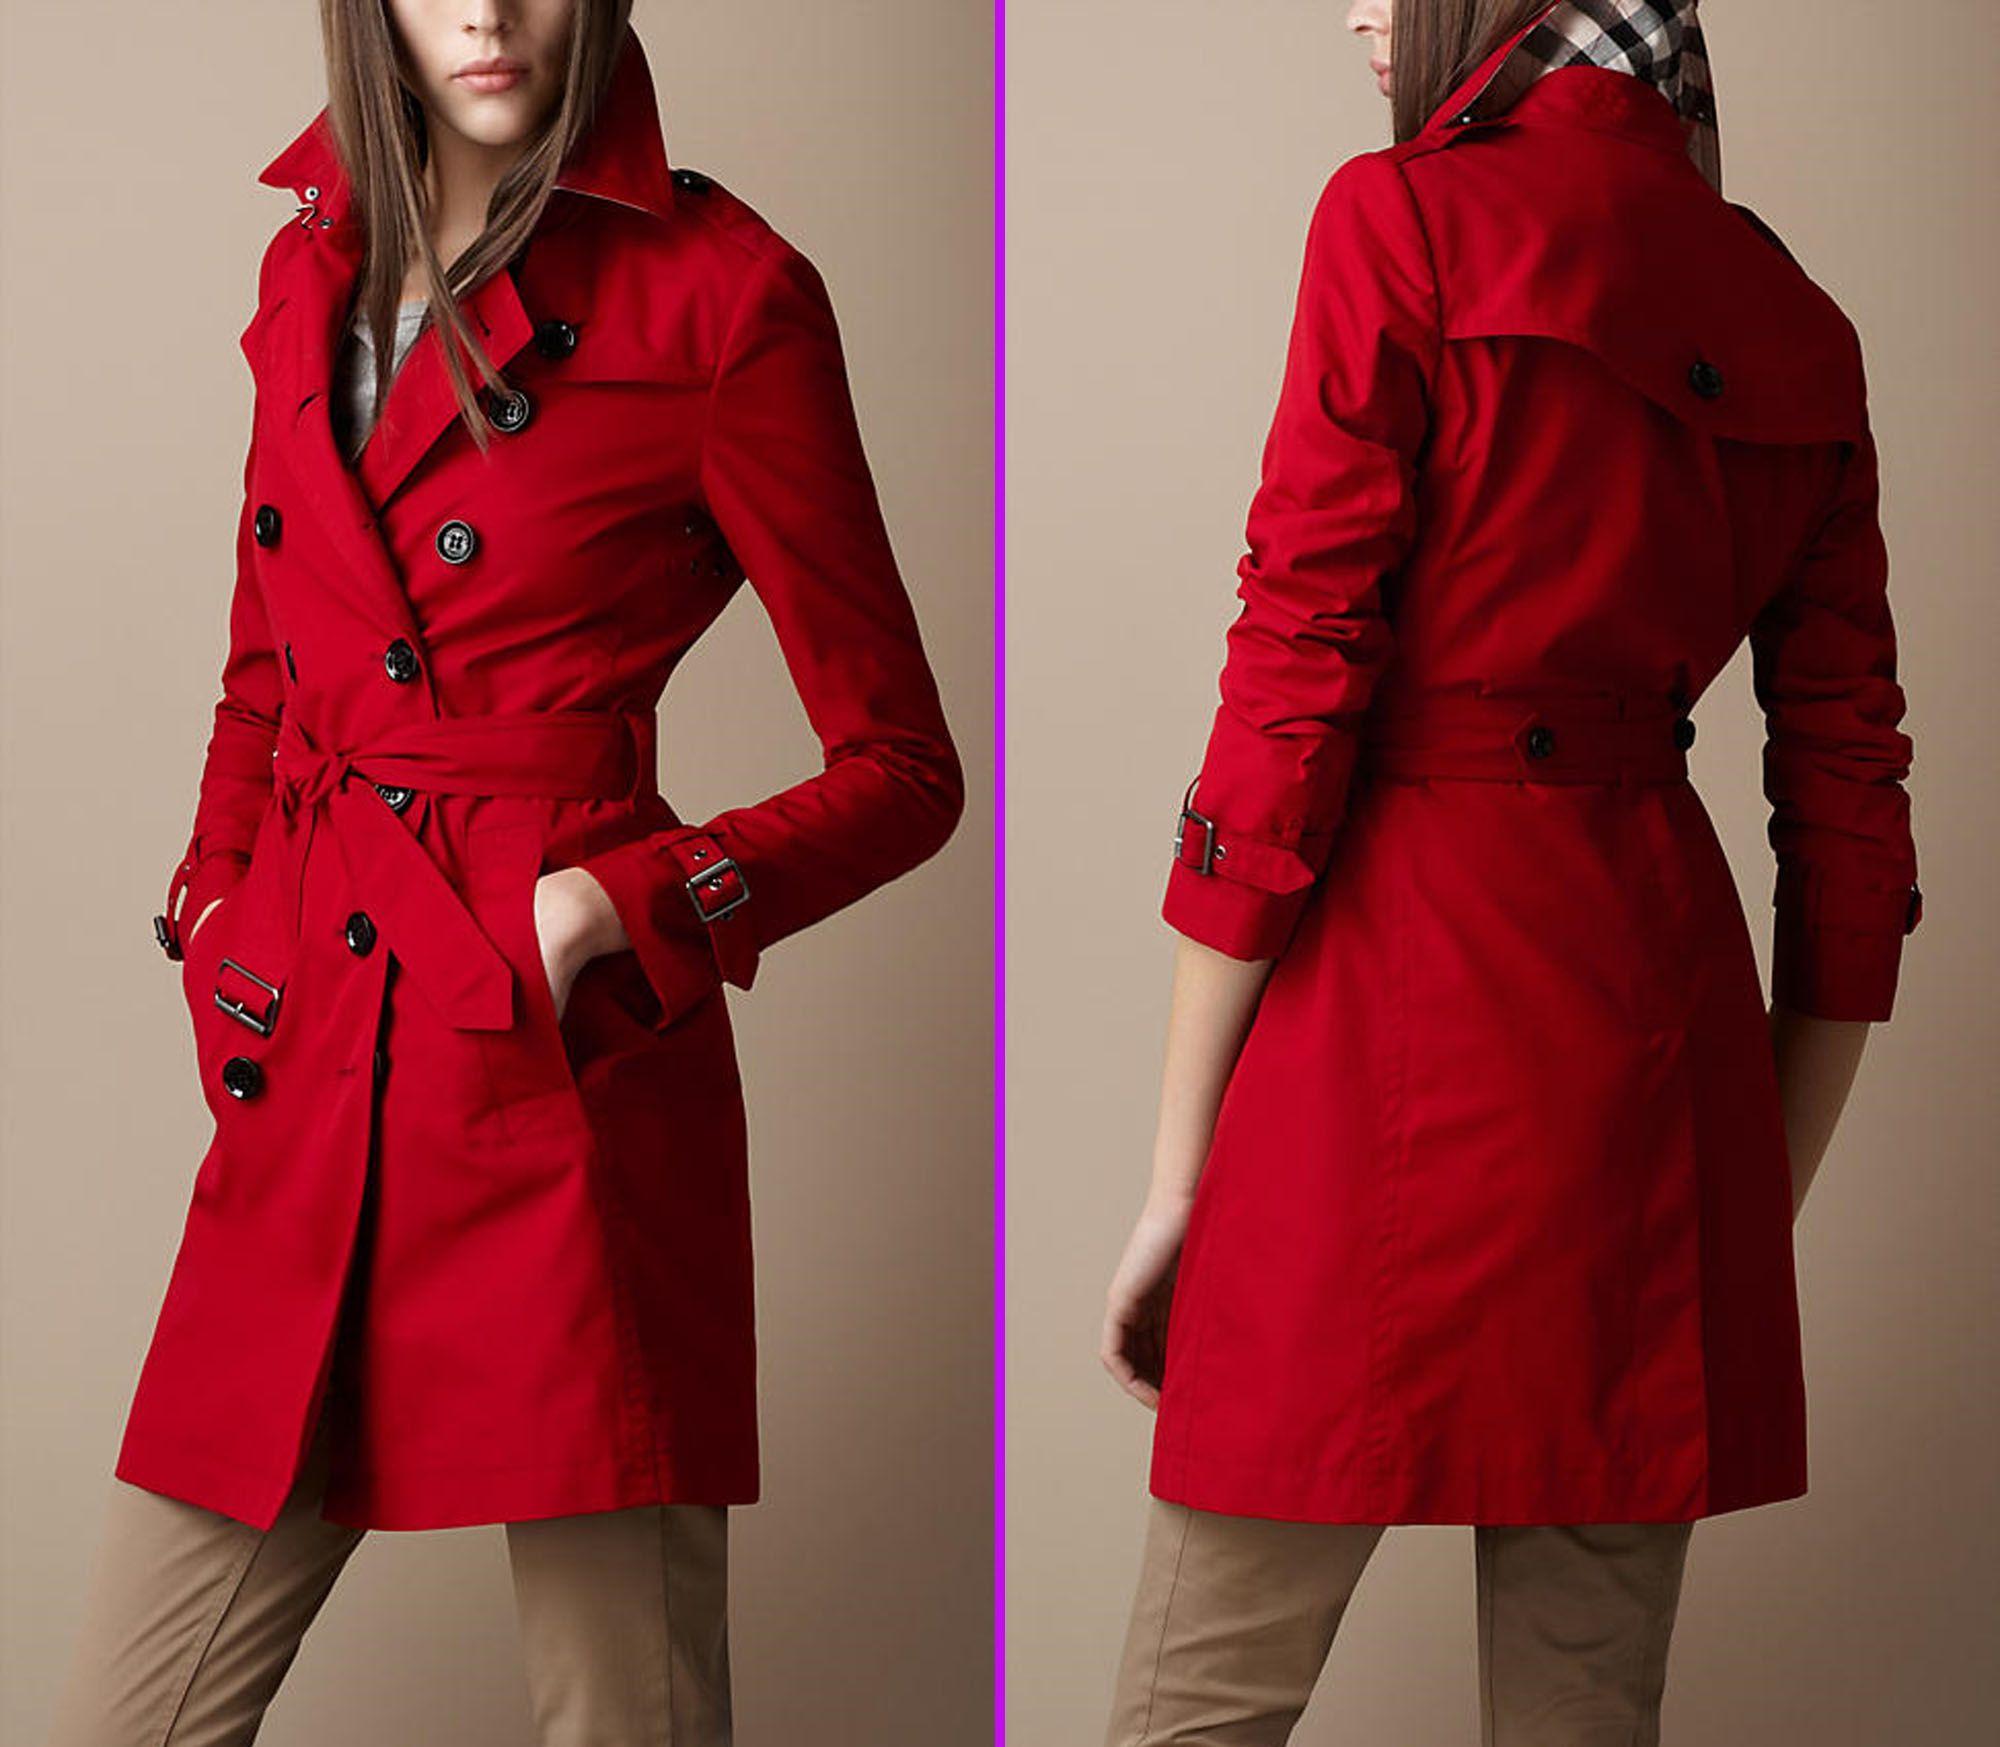 Burberry Women's Outerwear: Coats & Jackets | Nordstrom